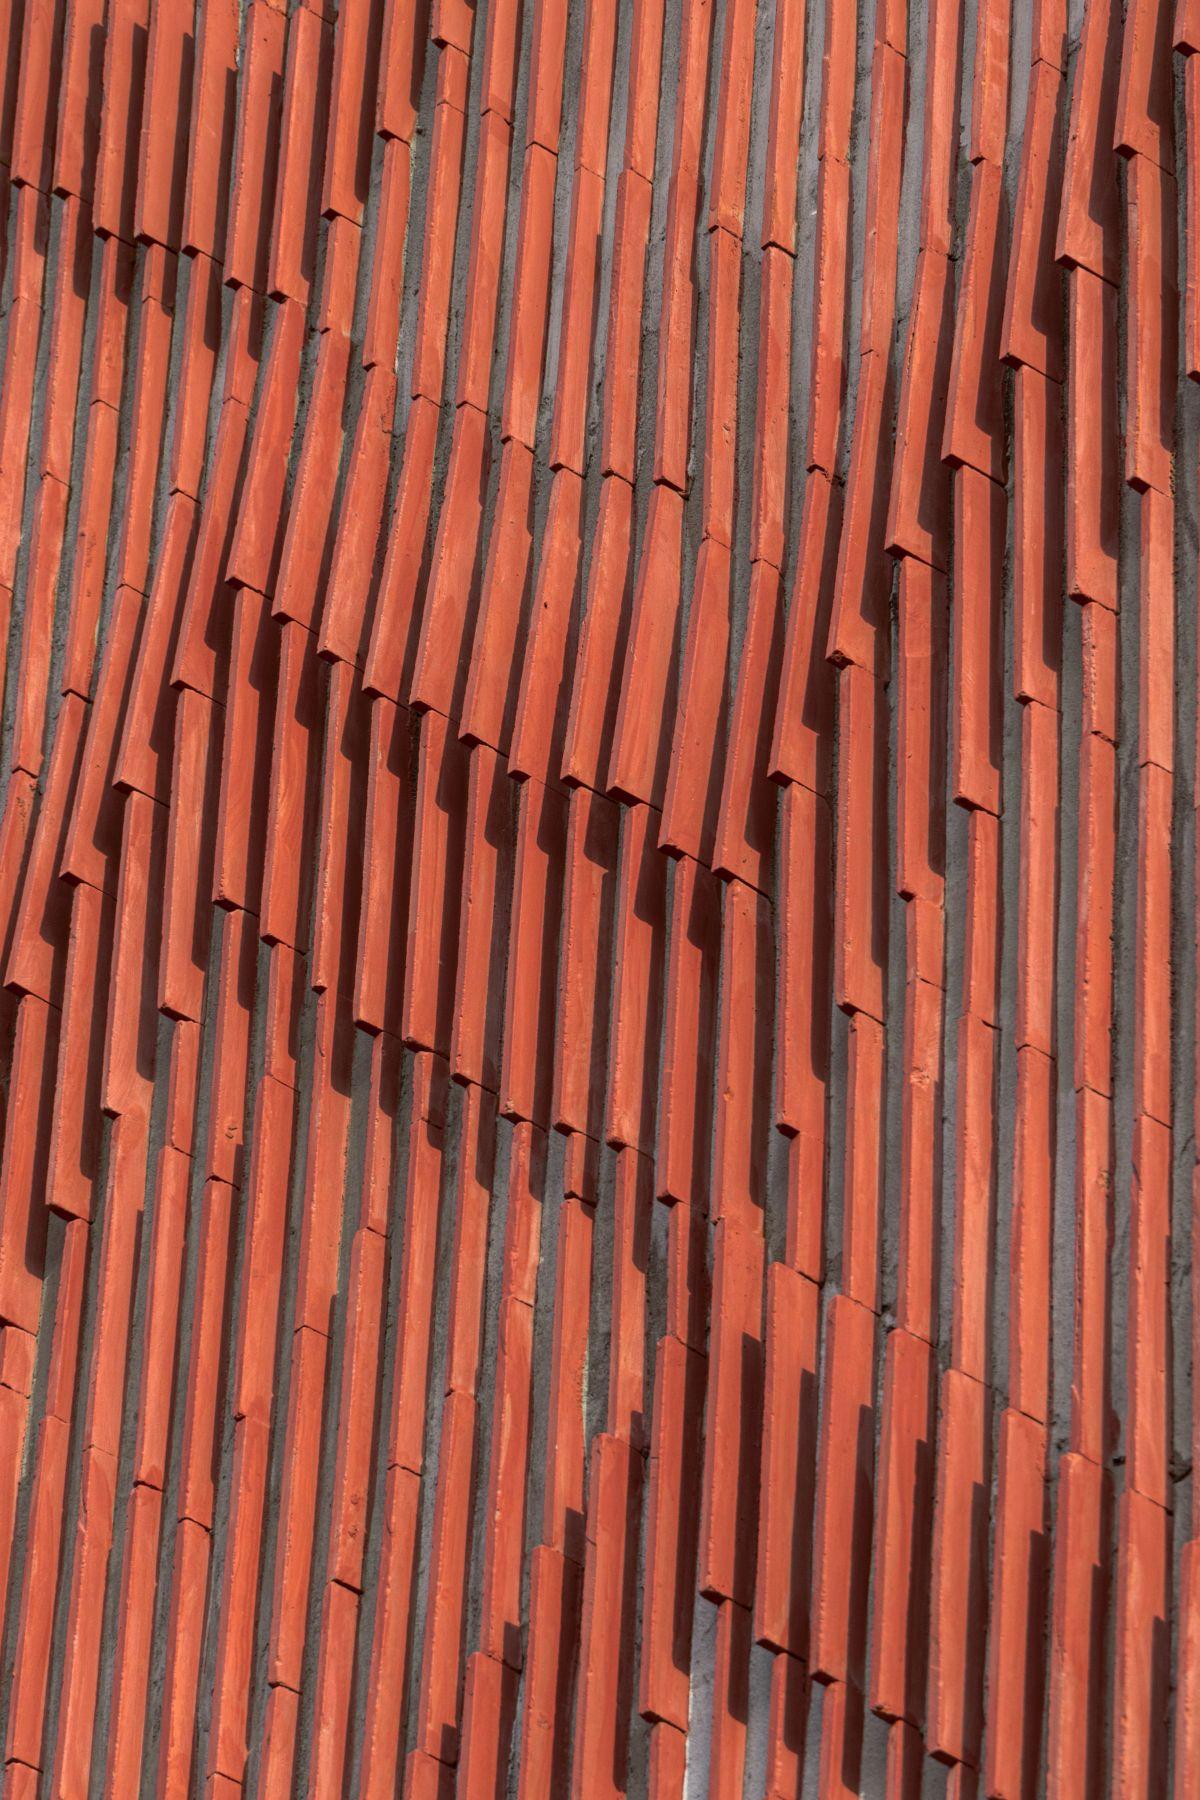 Clay roof tiles façade to minimize heat gain and has decorative function, at Vadodara, by Manoj Patel Design Studio 63